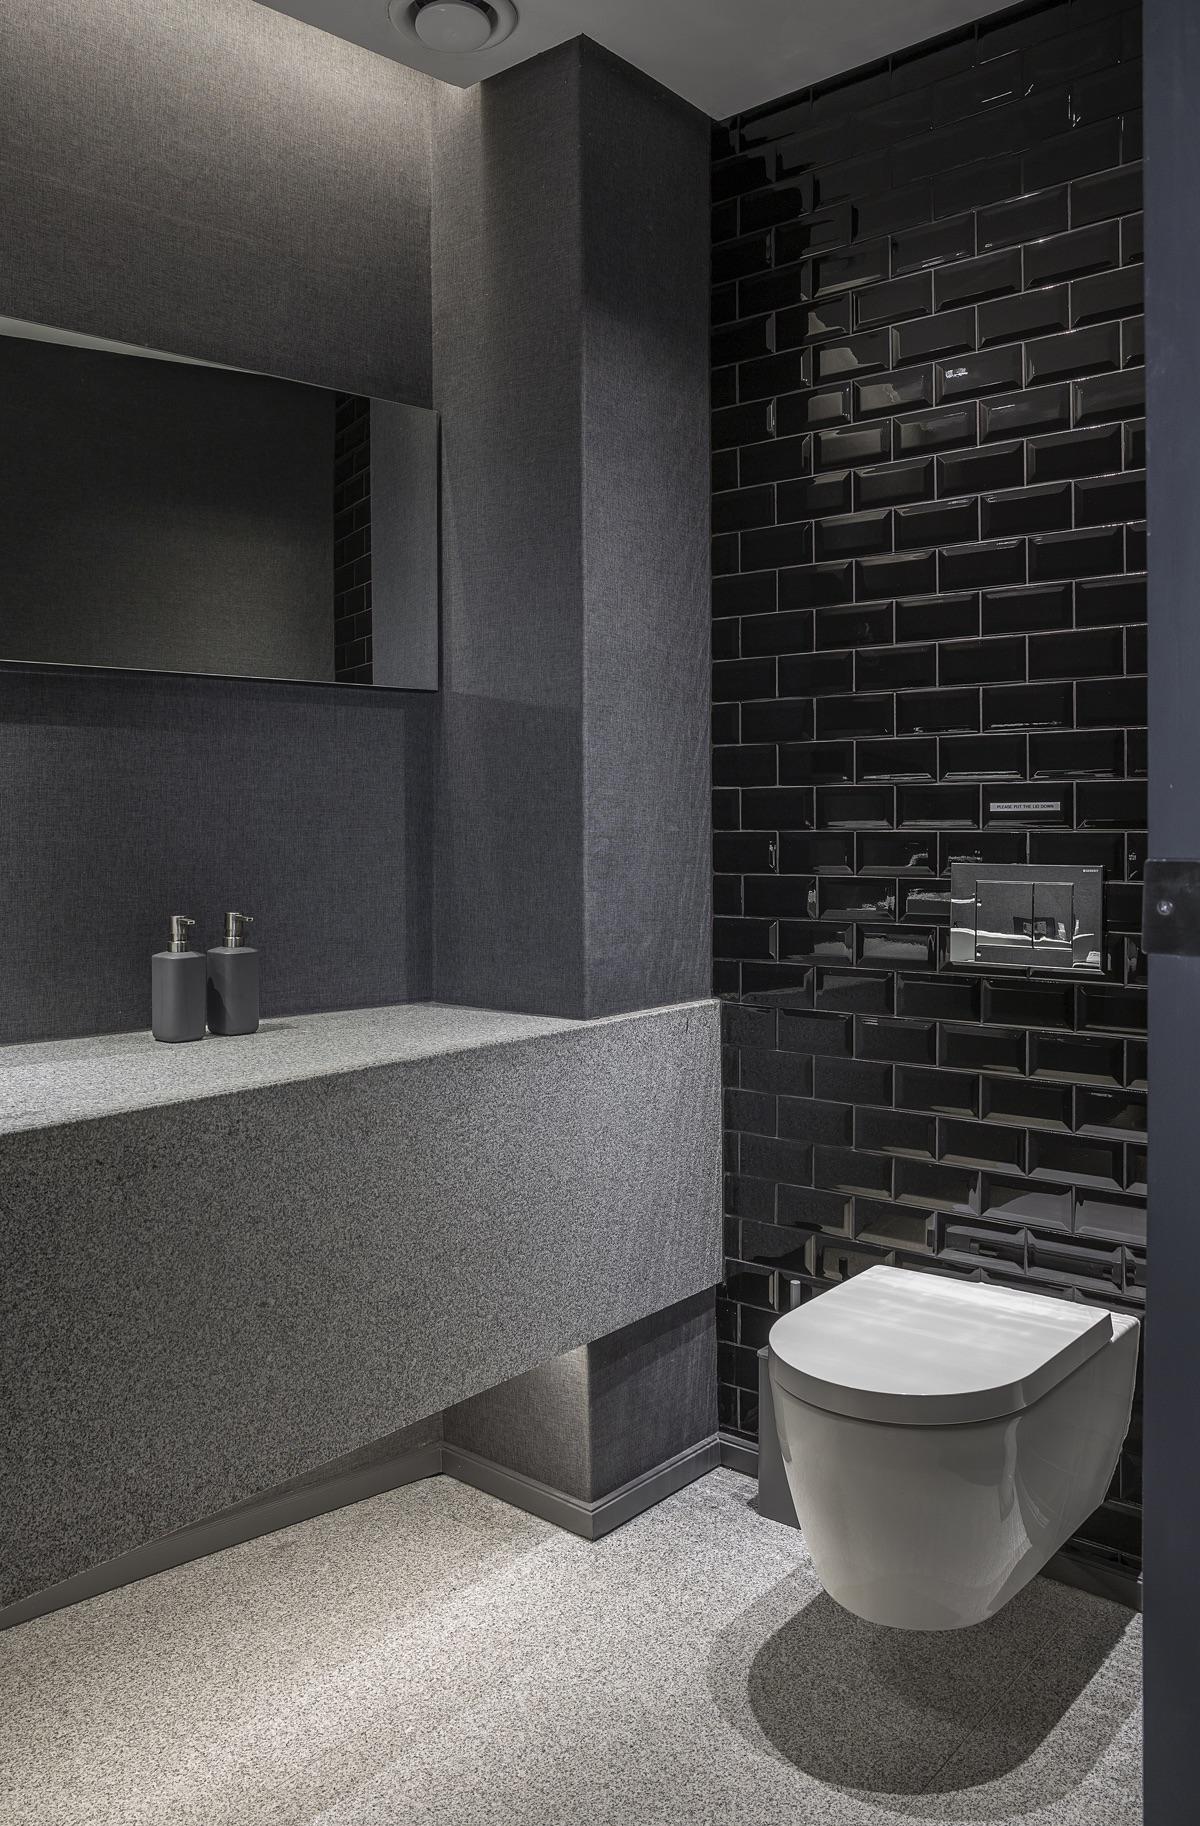 Artmar-GRANITE_COMMERCIAL-PROJECT_Kitchen-Aid-Head-Office-Showroom_Speckled-White-Granite-Vanity_Supply-Fit-1-1.jpg